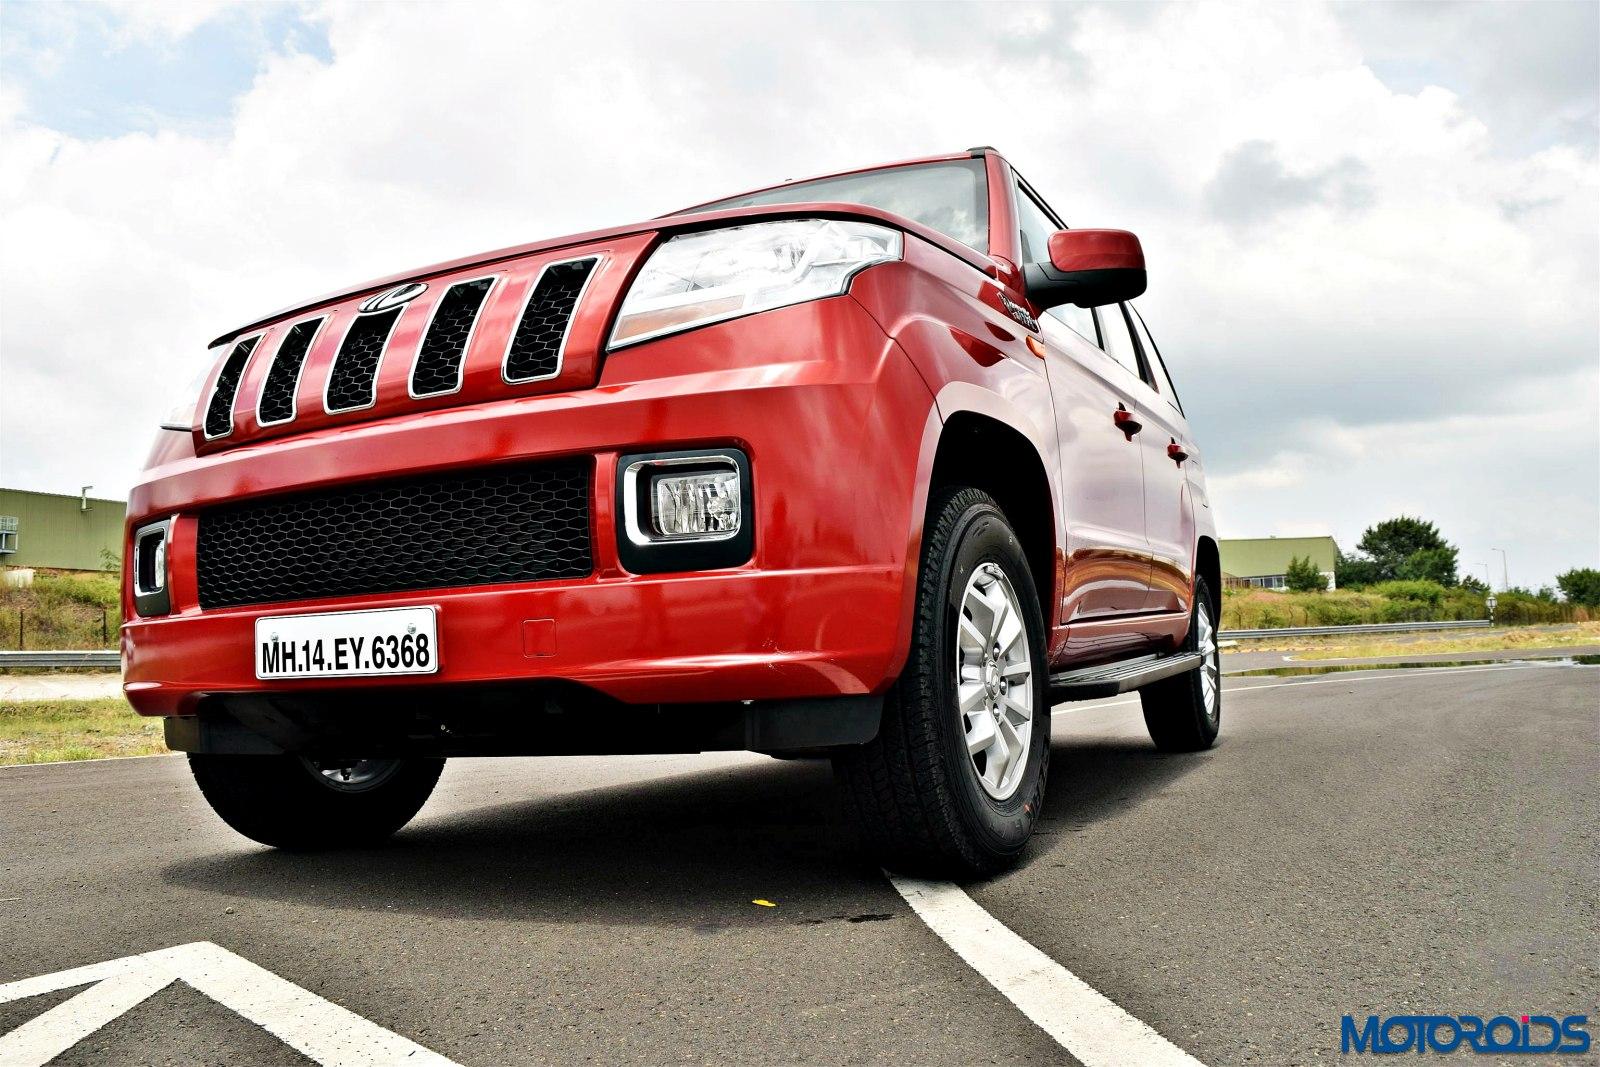 Mahindra Tuv 300 Review Tough Little Guy Motoroids